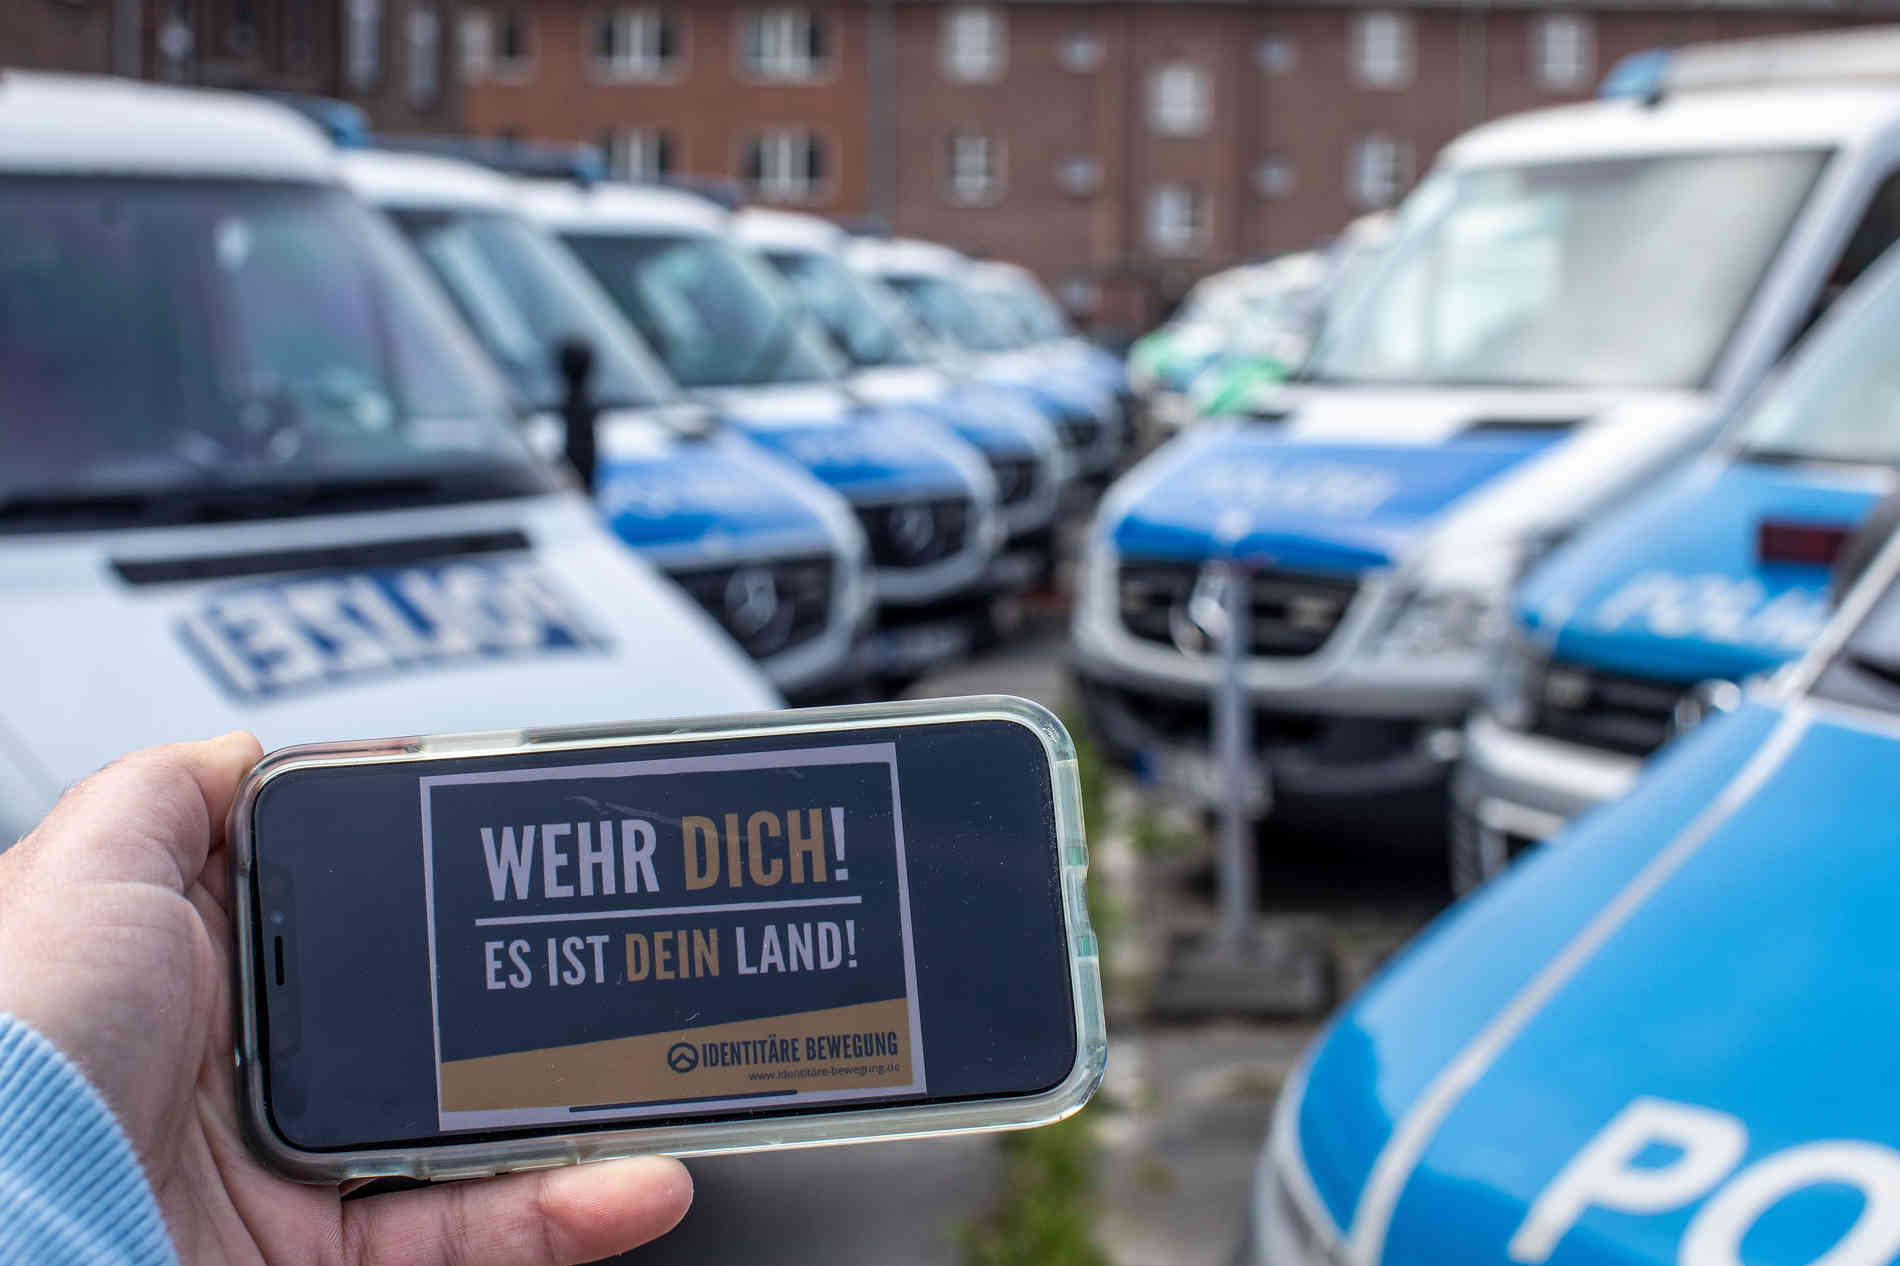 Rechter Aufkleber Polizei Duisburg Entlastet Beamte